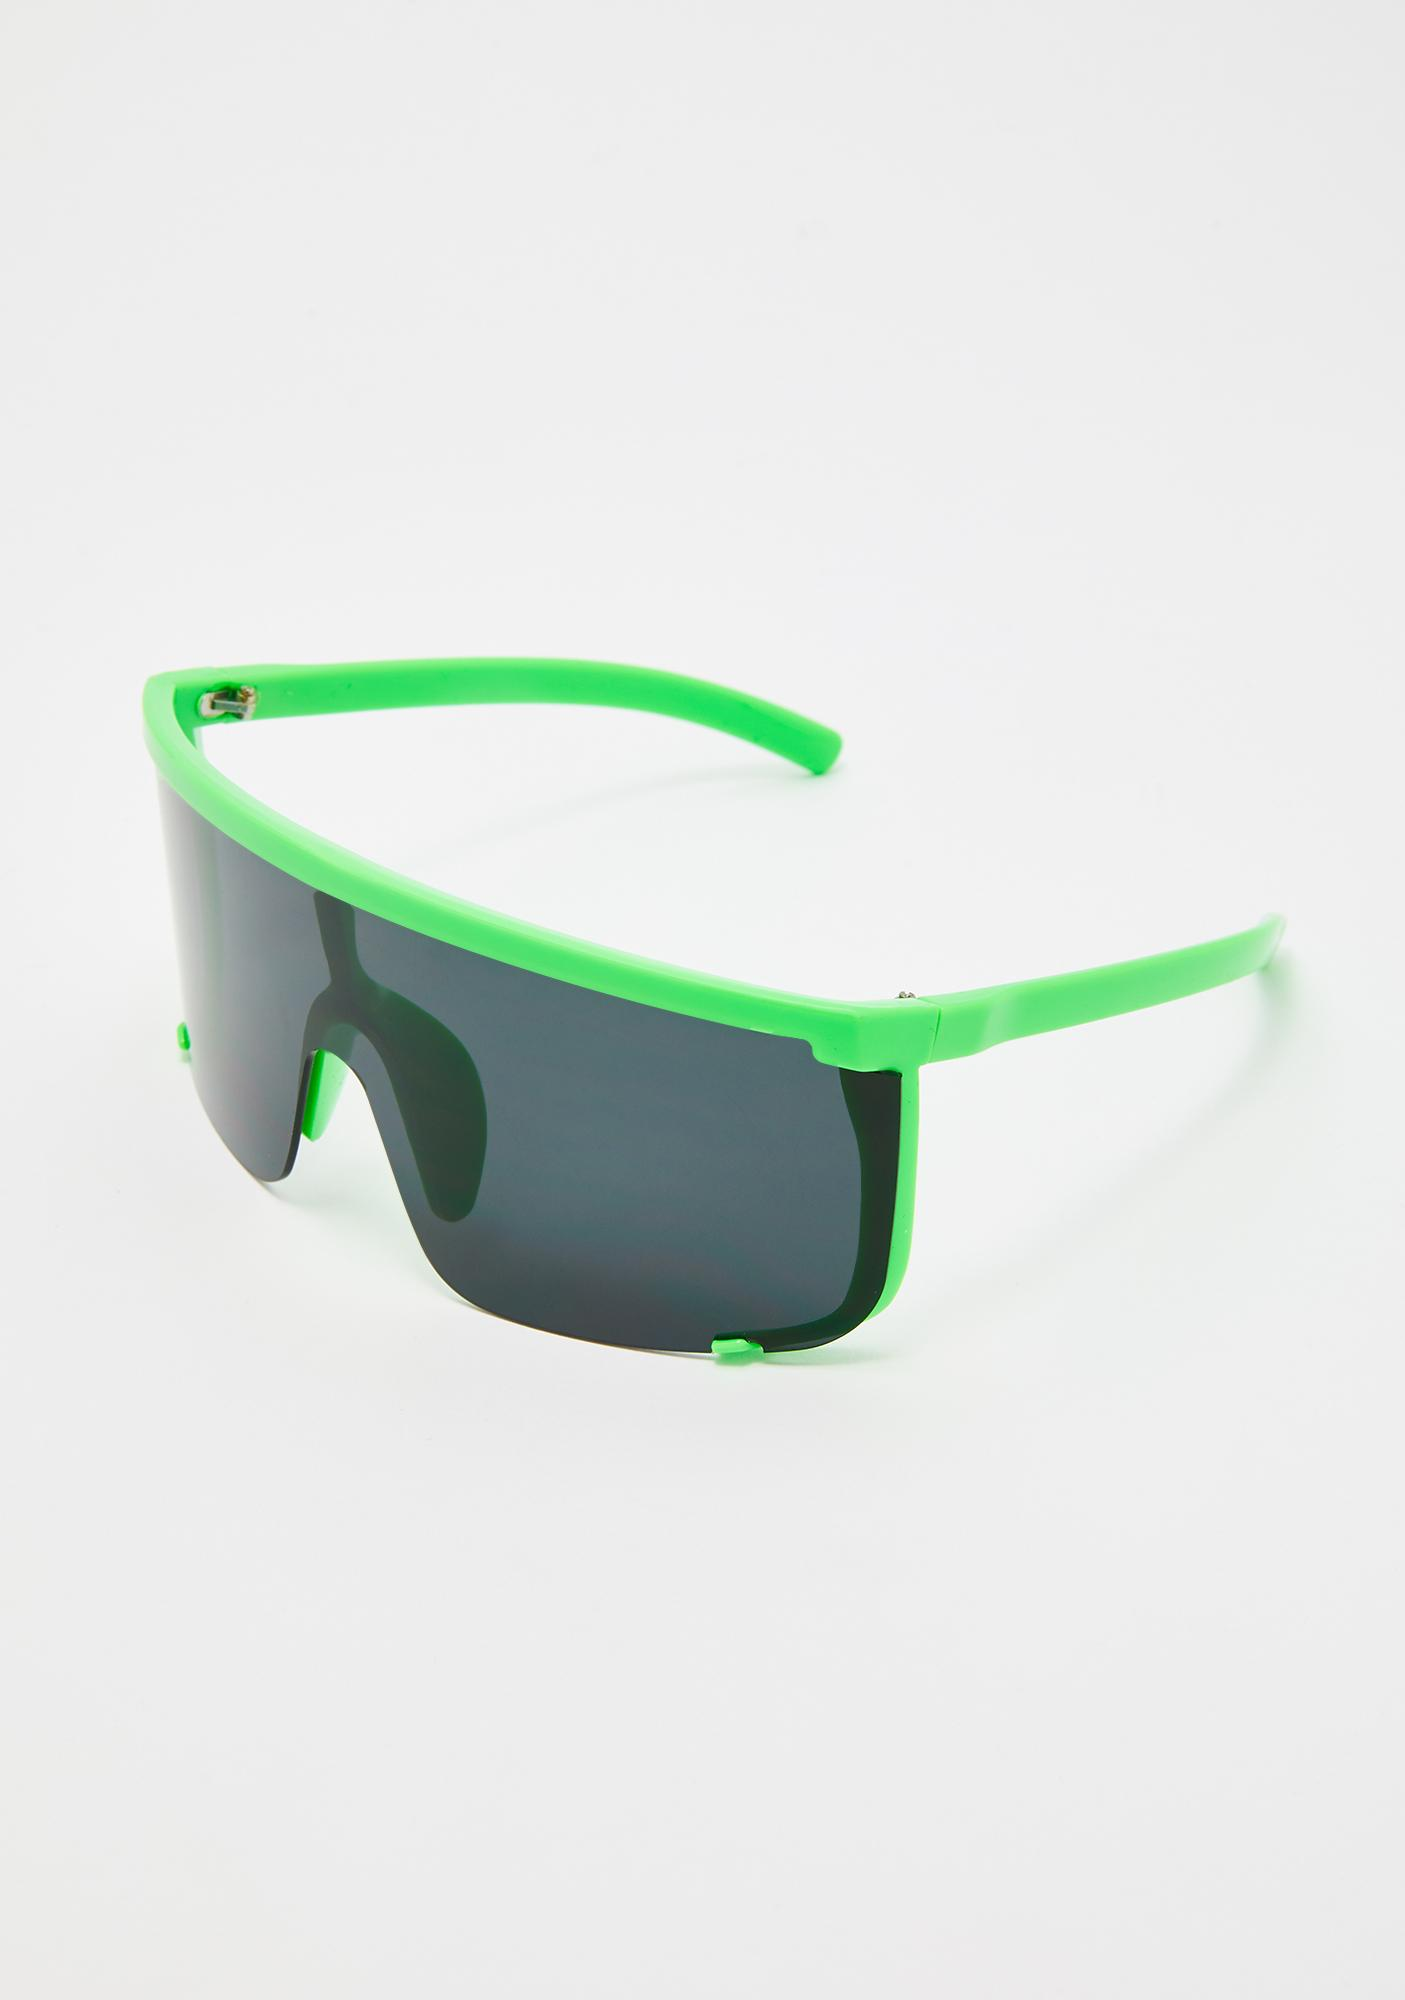 Boat Rockin' Shield Sunglasses